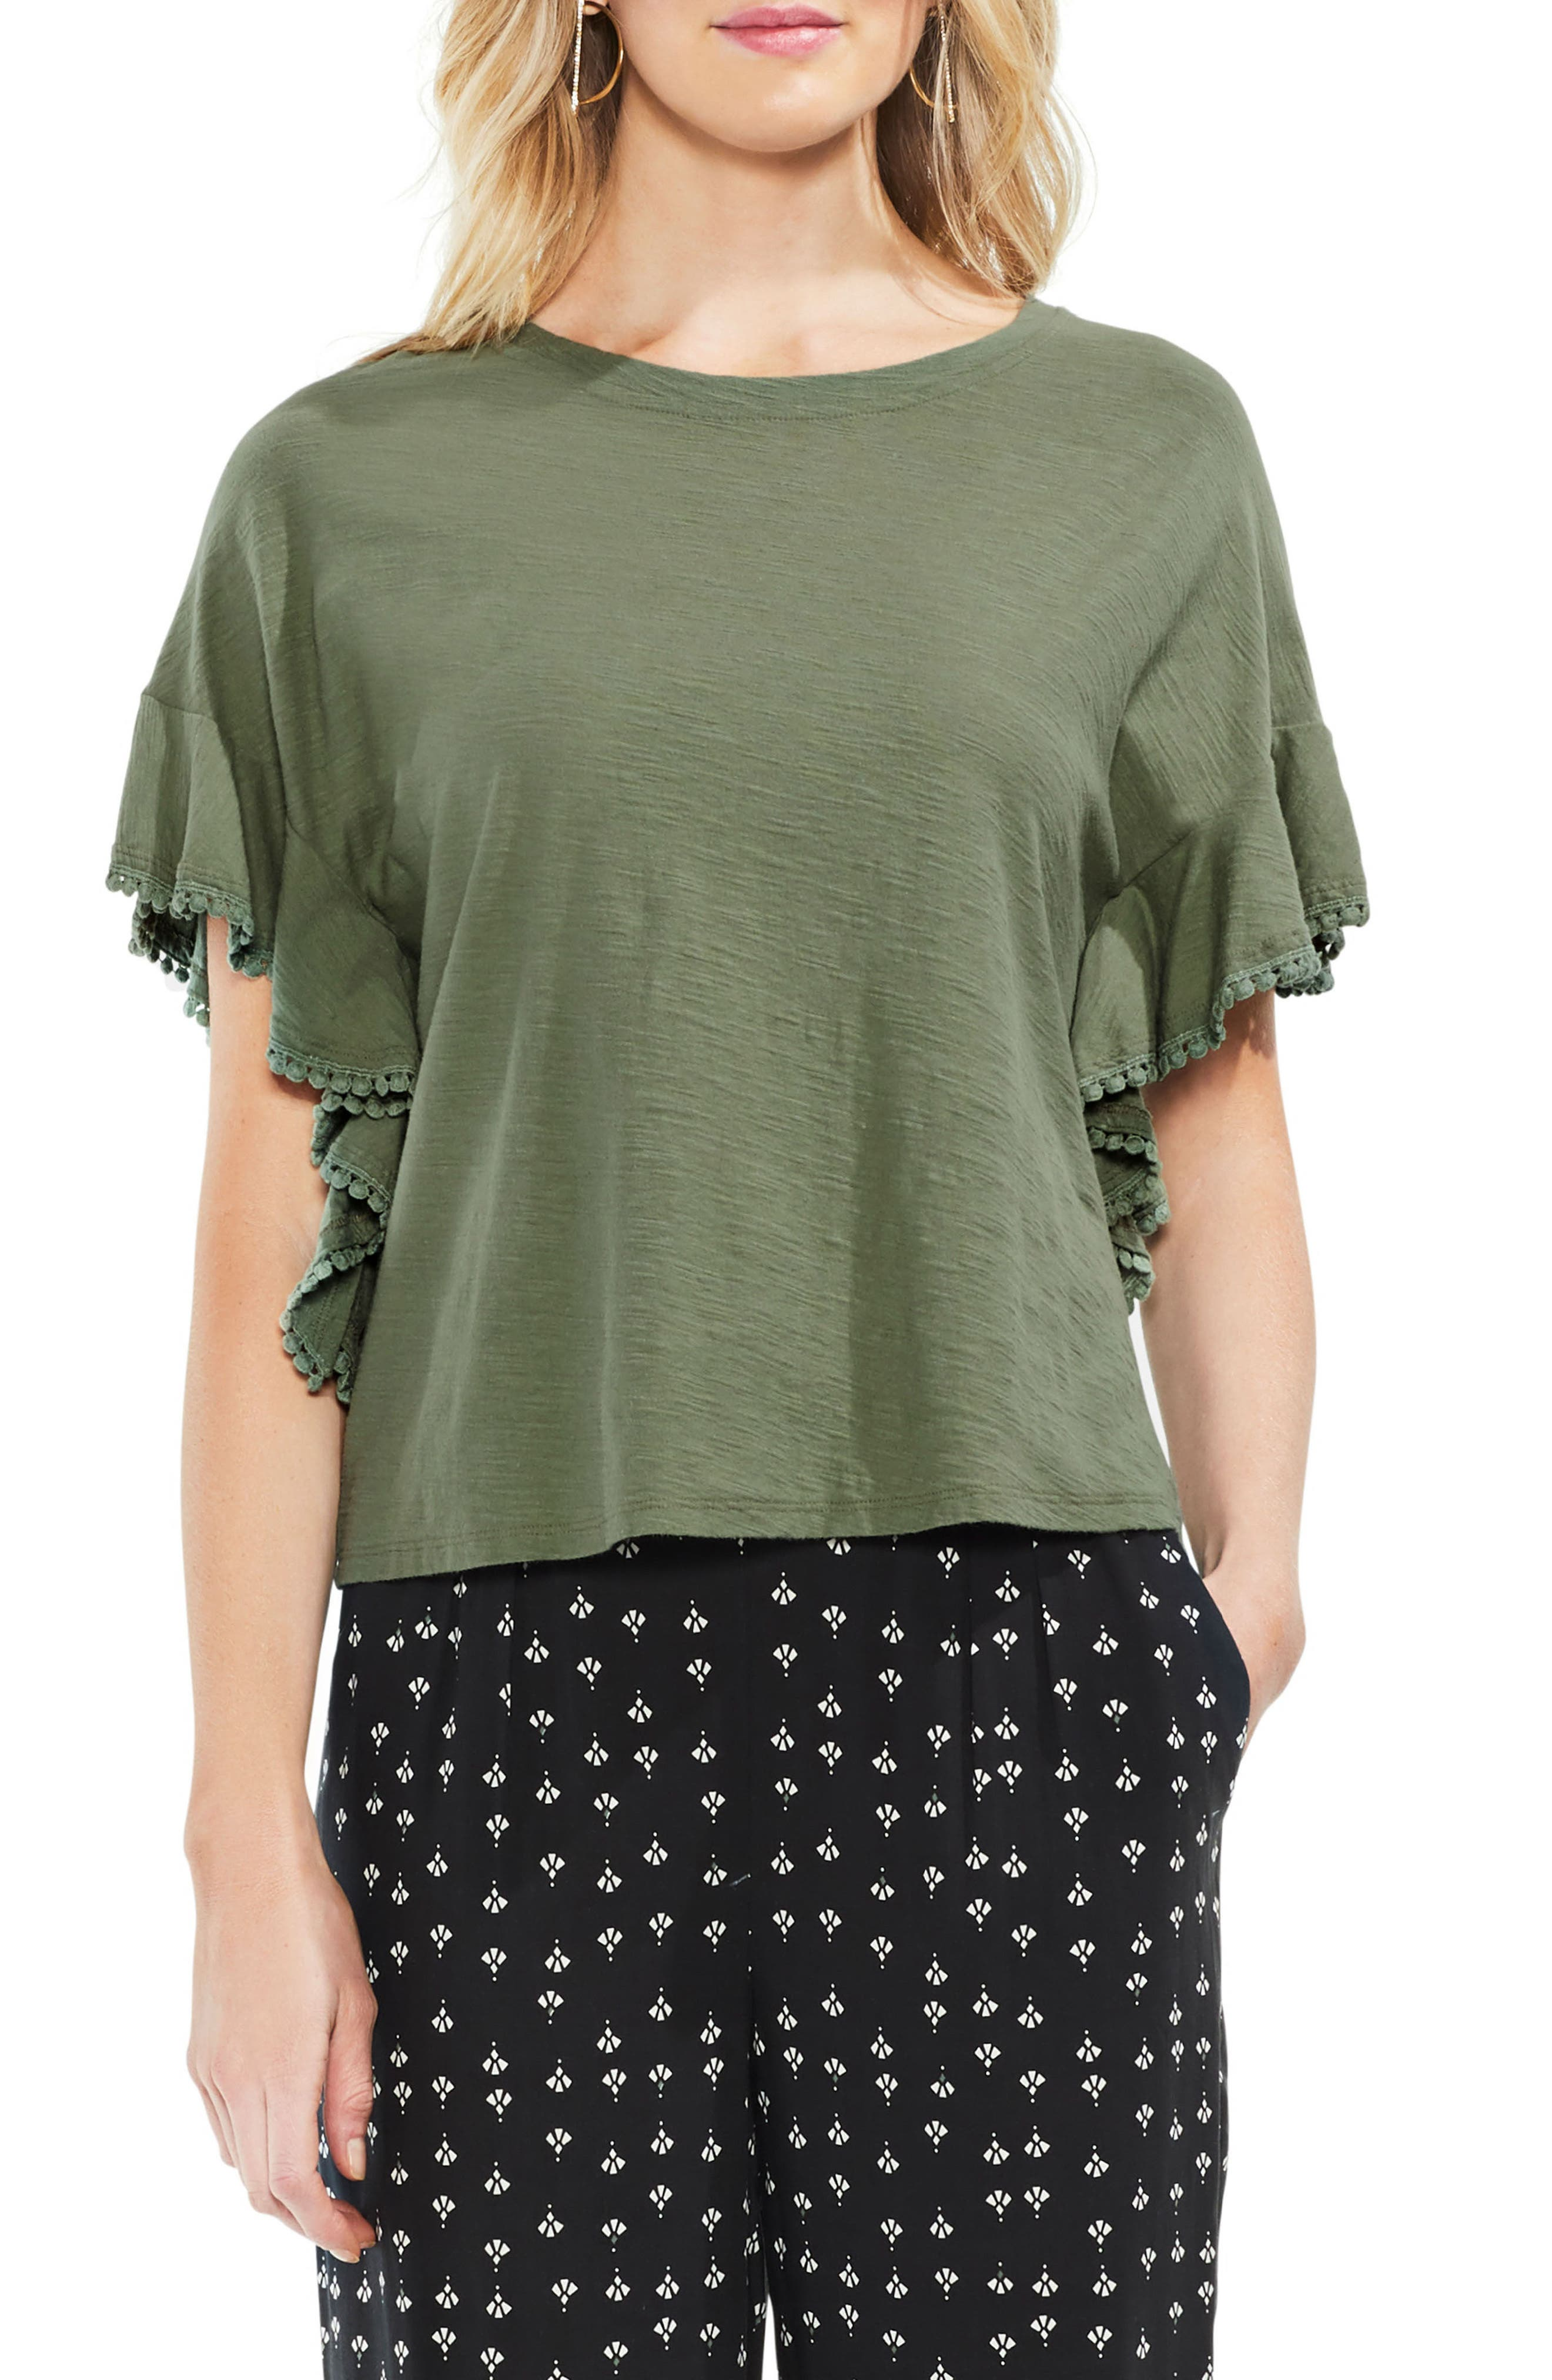 Ruffle Sleeve Tee,                         Main,                         color, Canopy Green